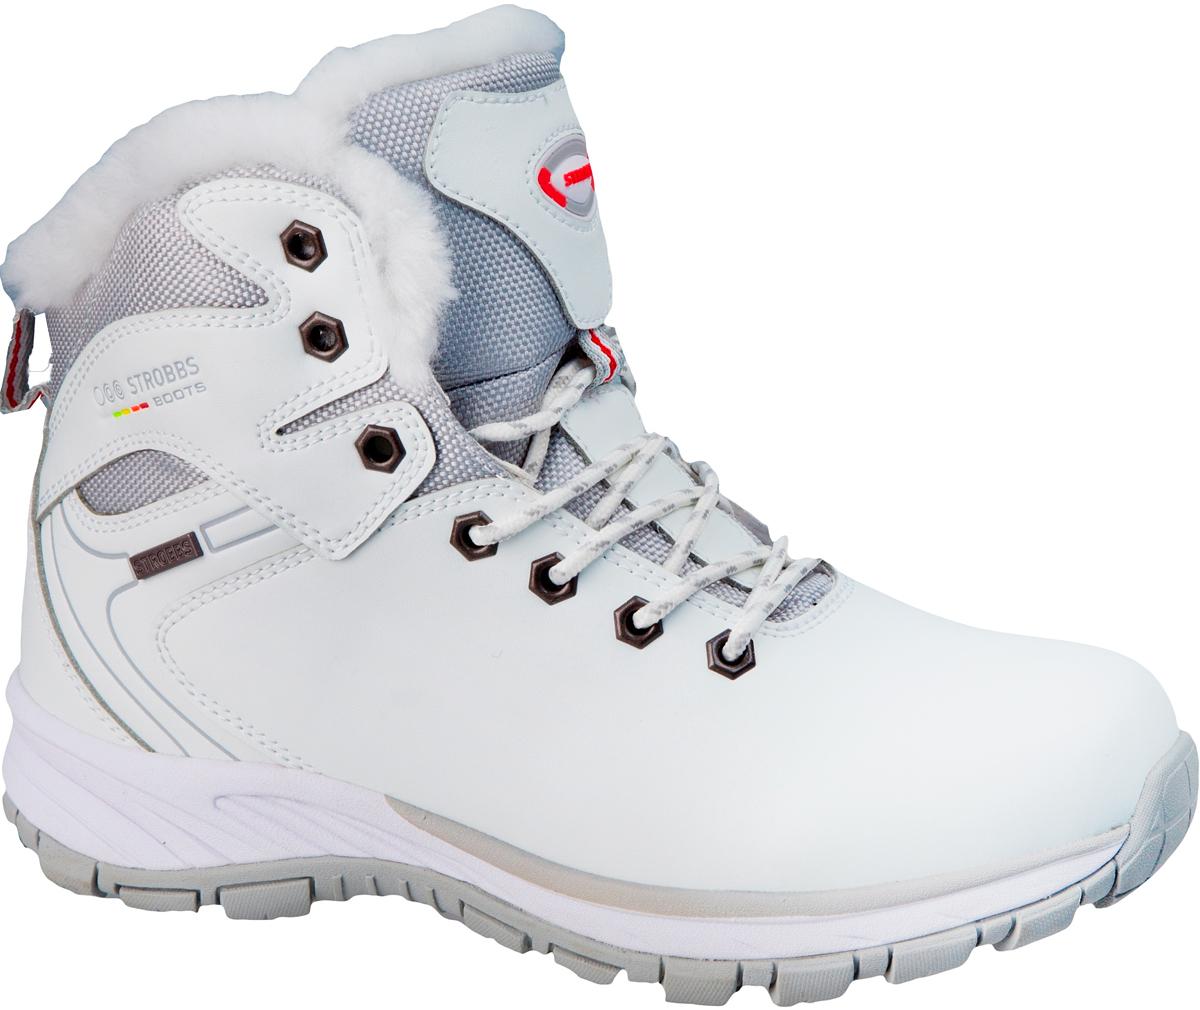 Ботинки женские Strobbs, цвет: белый. F8192-6. Размер 36F8192-6